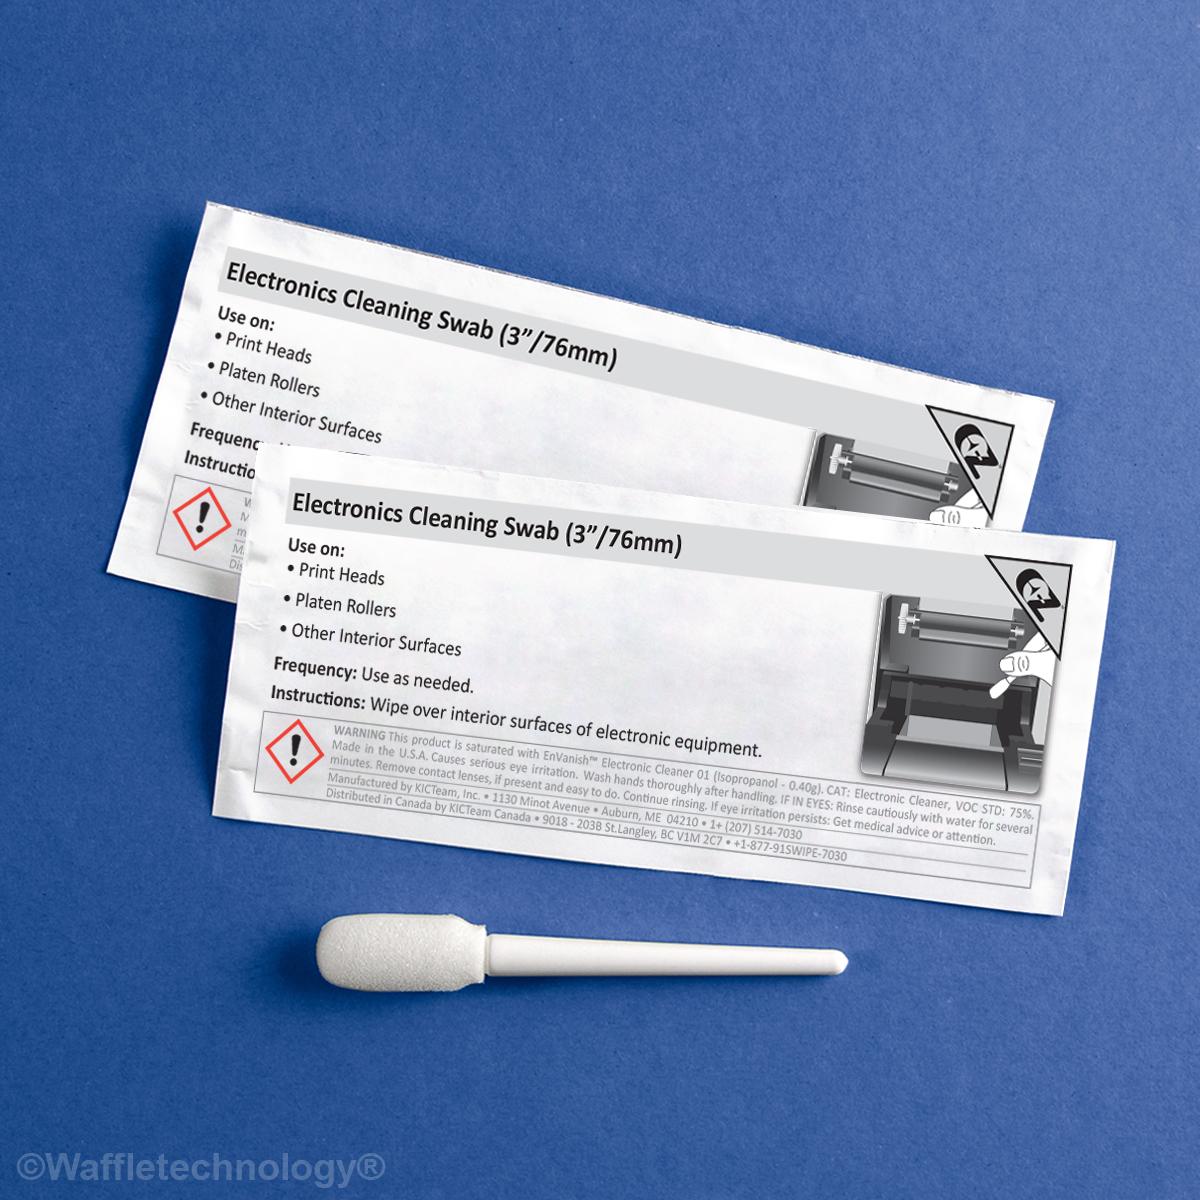 Elektronik Reinigung Tupfer (3 / 76mm)